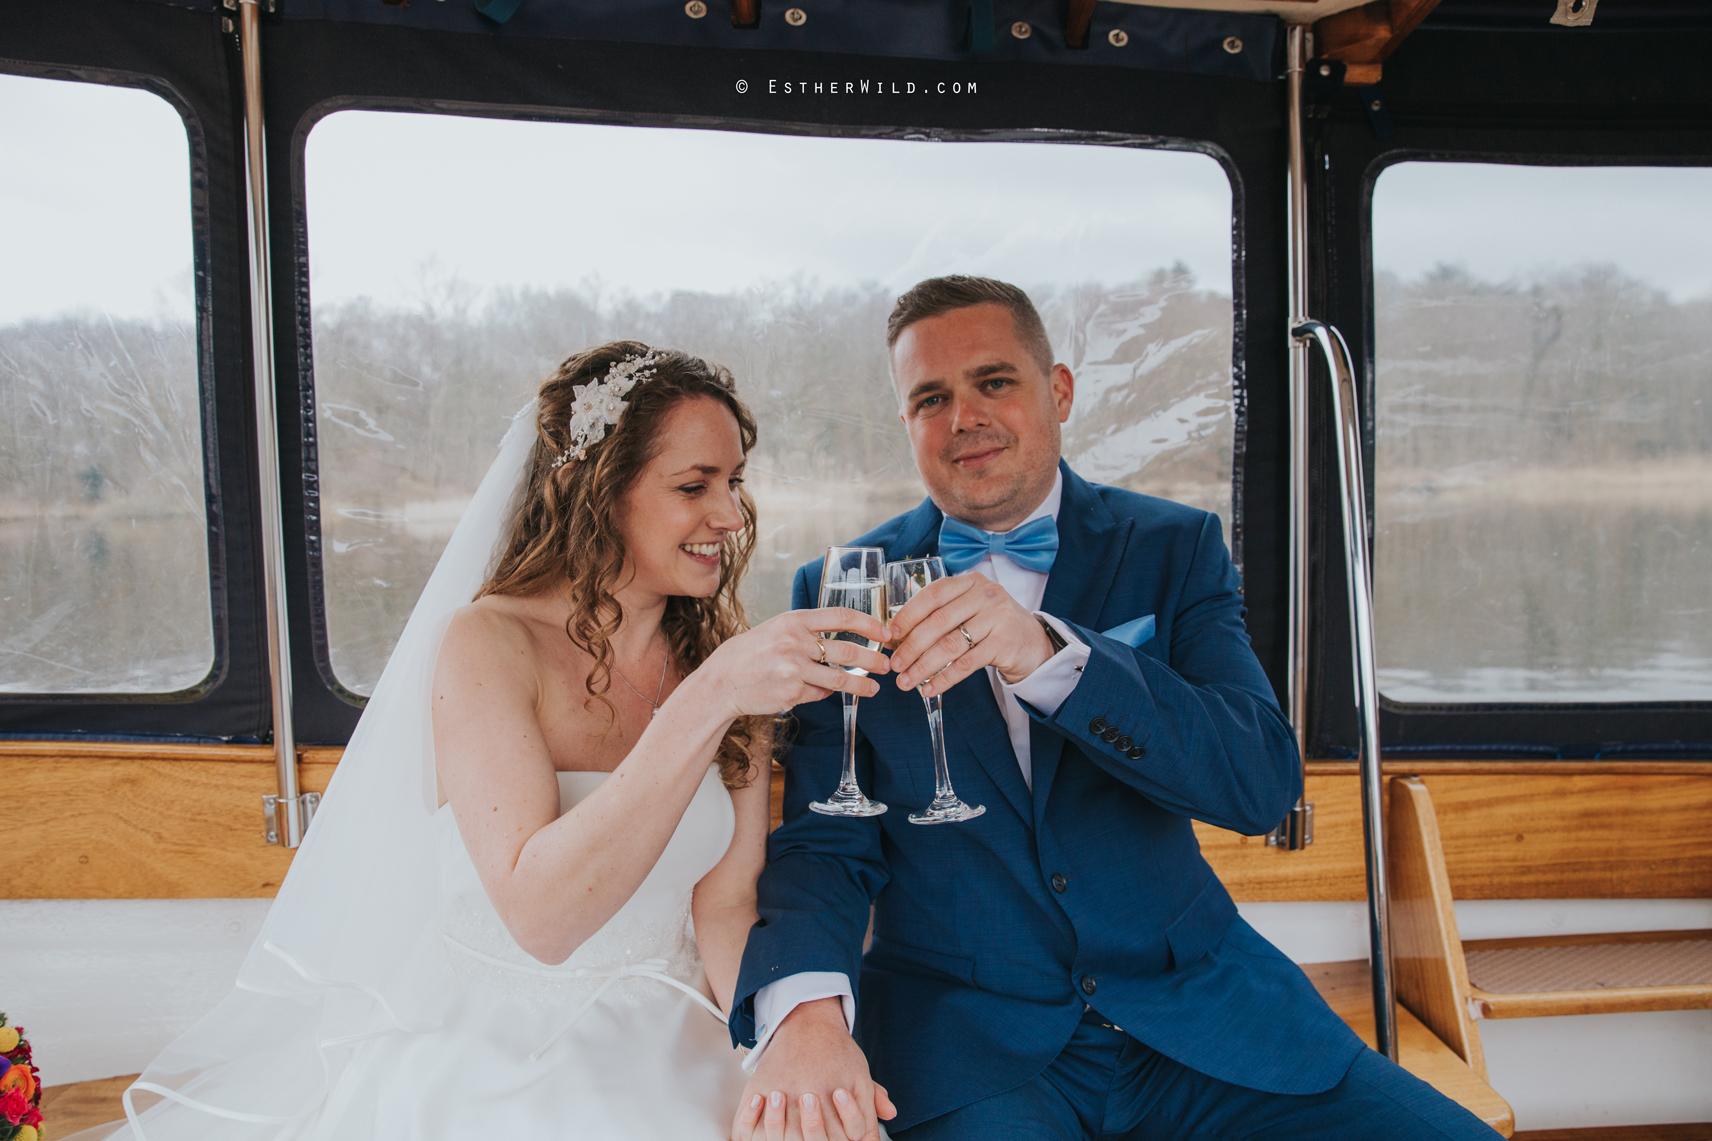 The_BoatHouse_Wedding_Venue_Ormesby_Norfolk_Broads_Boat_Wedding_Photography_Esther_Wild_Photographer_IMG_1448.jpg